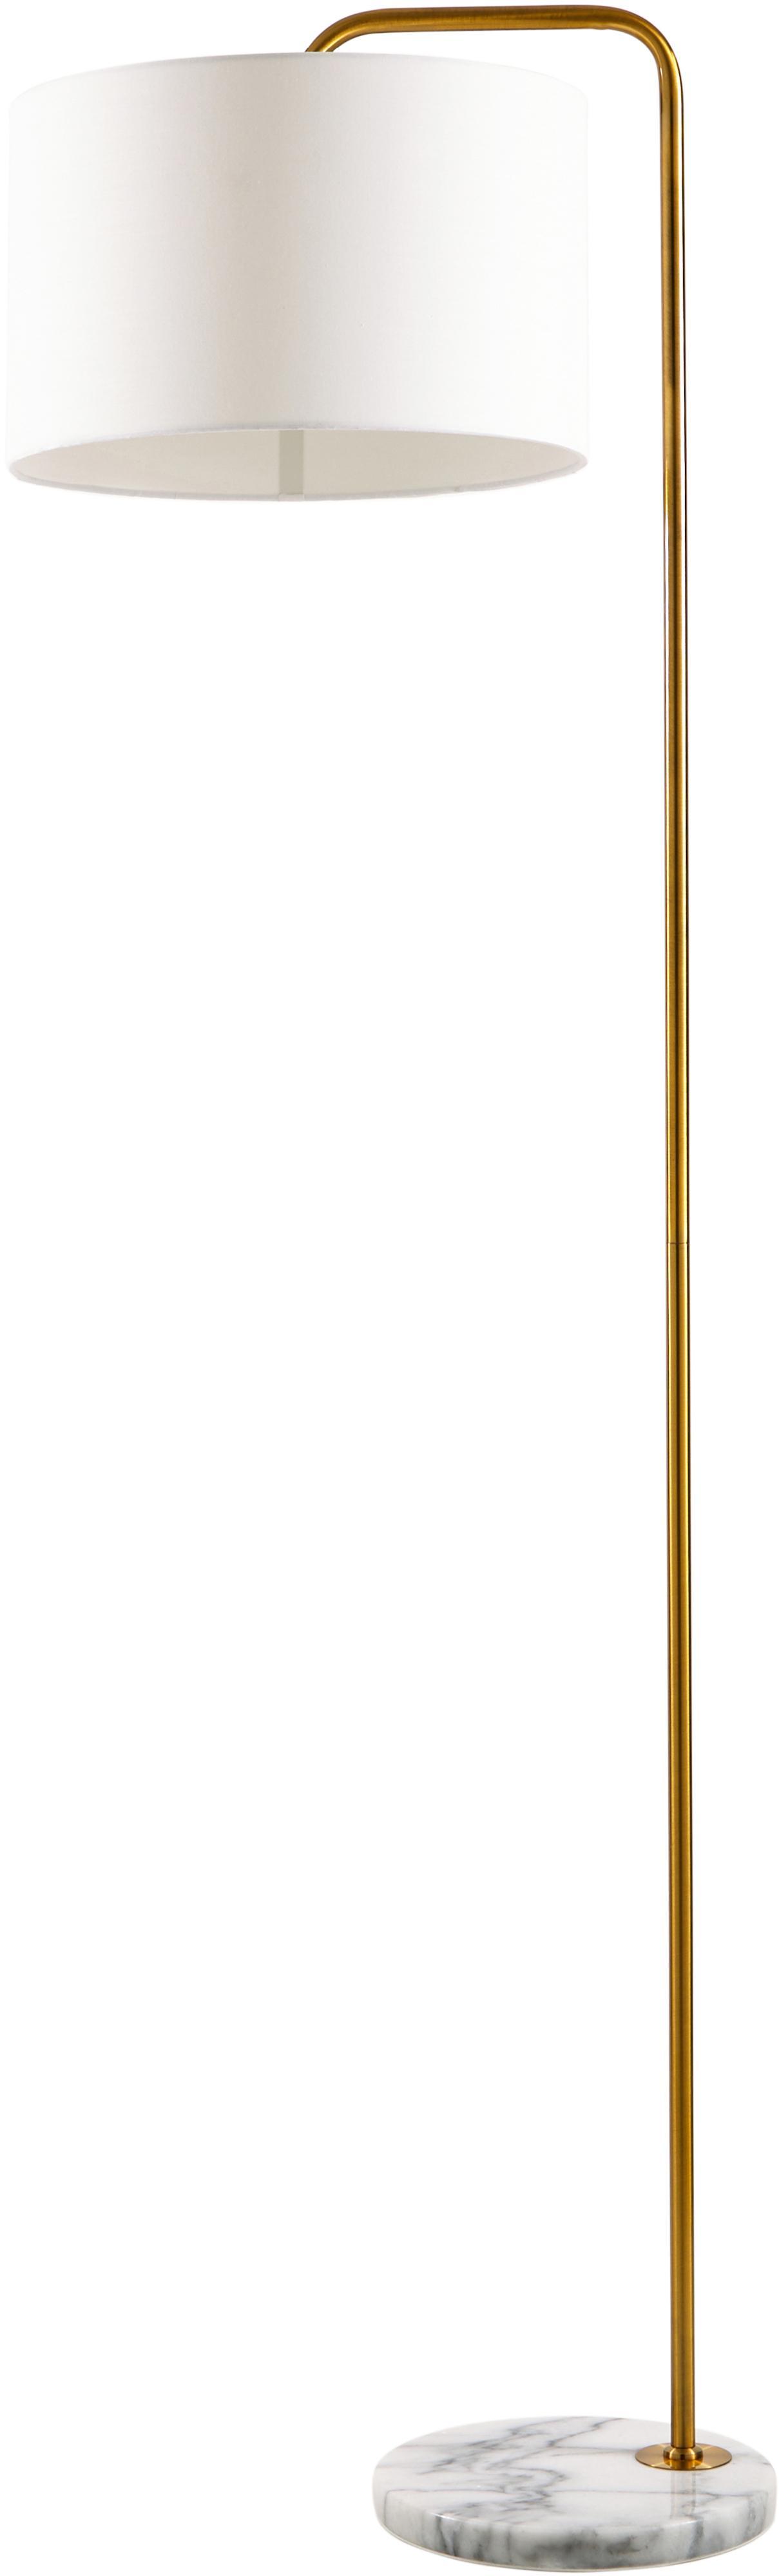 Vloerlamp Montreal met marmeren voet, Lampenkap: textiel, Lampvoet: marmer, Frame: gegalvaniseerd metaal, Wit, goudkleurig, Ø 35 x H 155 cm